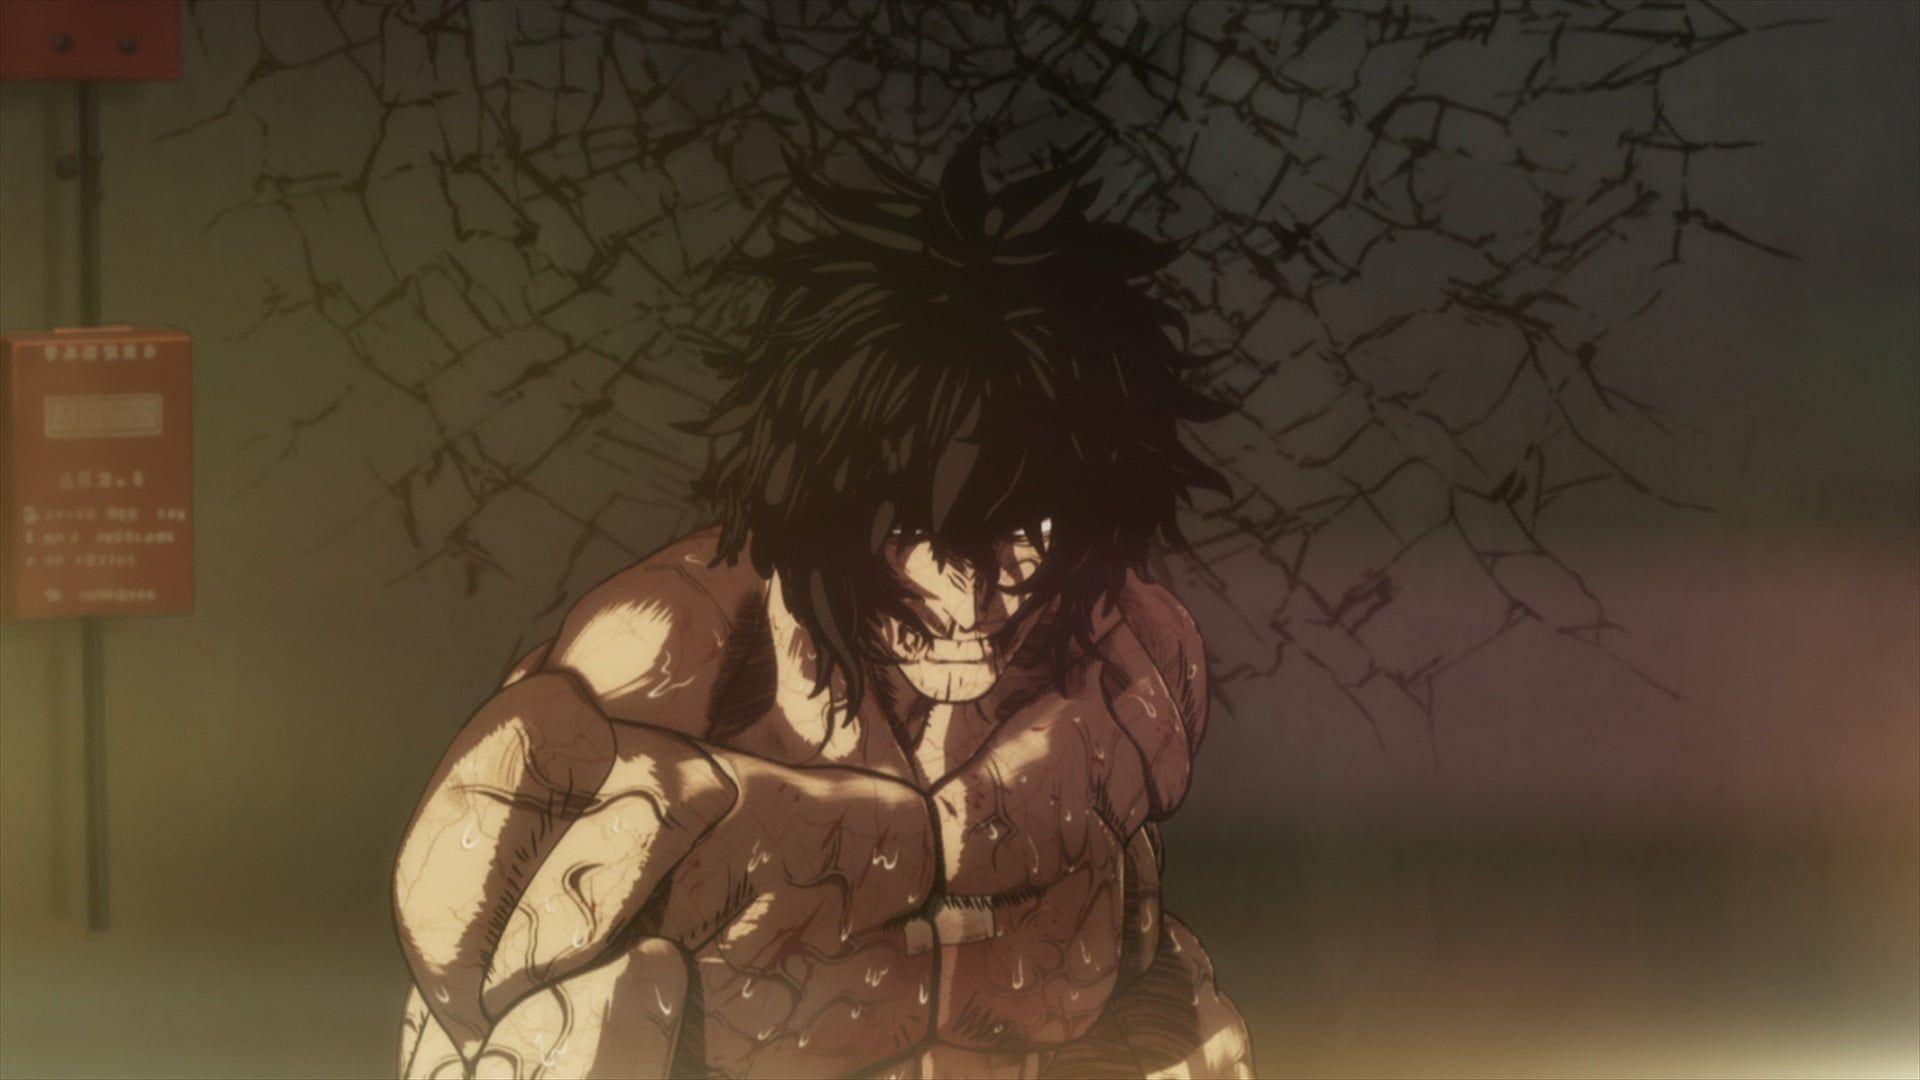 Kengan Ashura Part Ll Anime Artwork Aesthetic Anime Anime